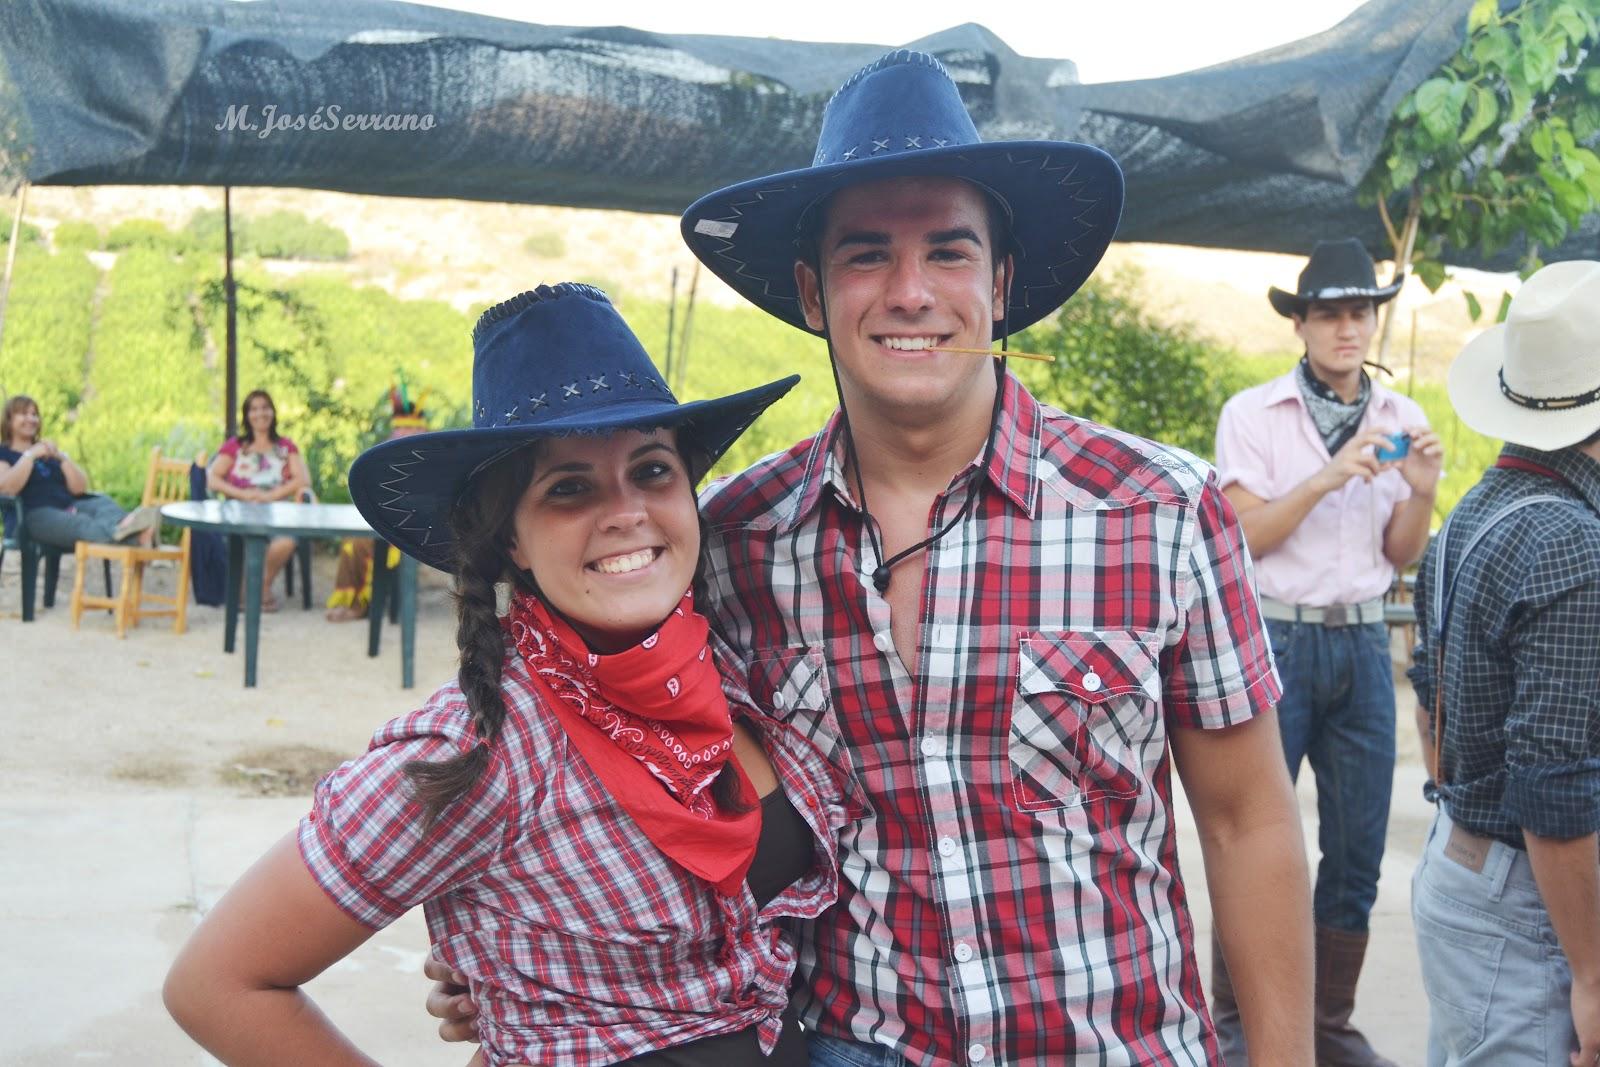 Disfraz de vaquera para mujer Disfraz de vaquero para hombre 6541910f1f7